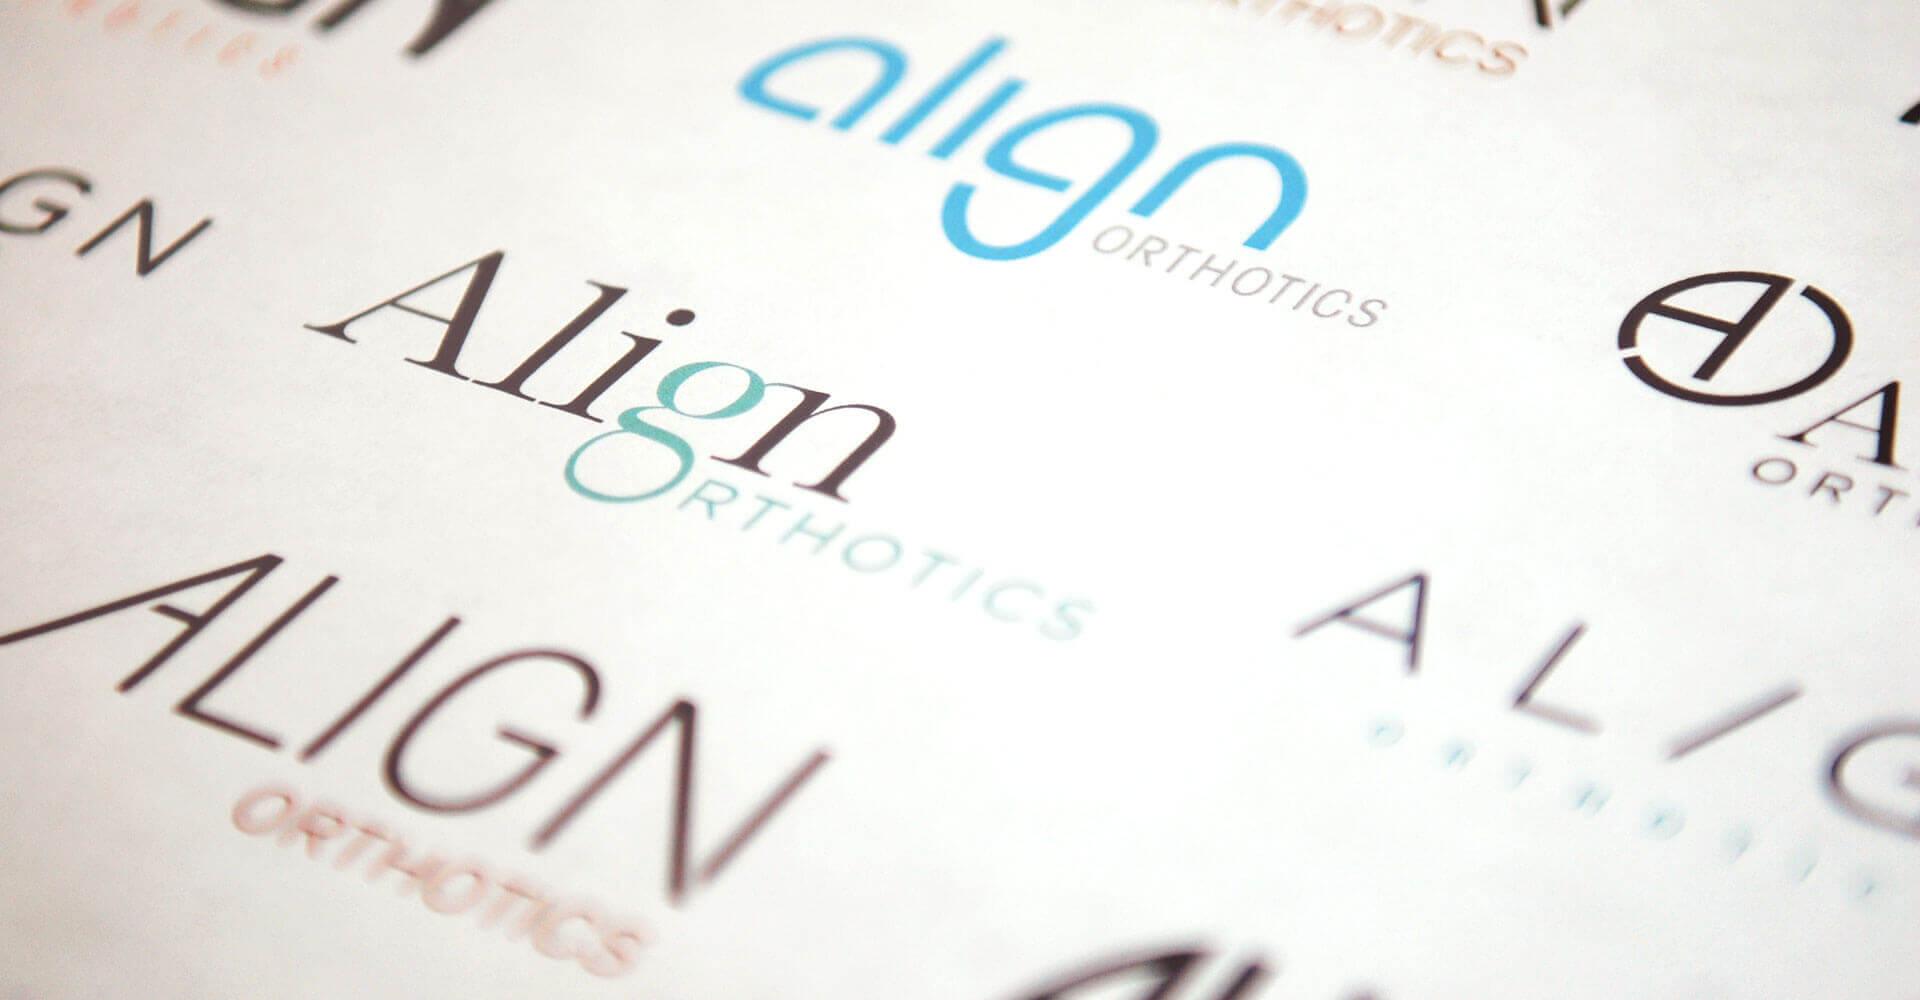 Align Orthotics